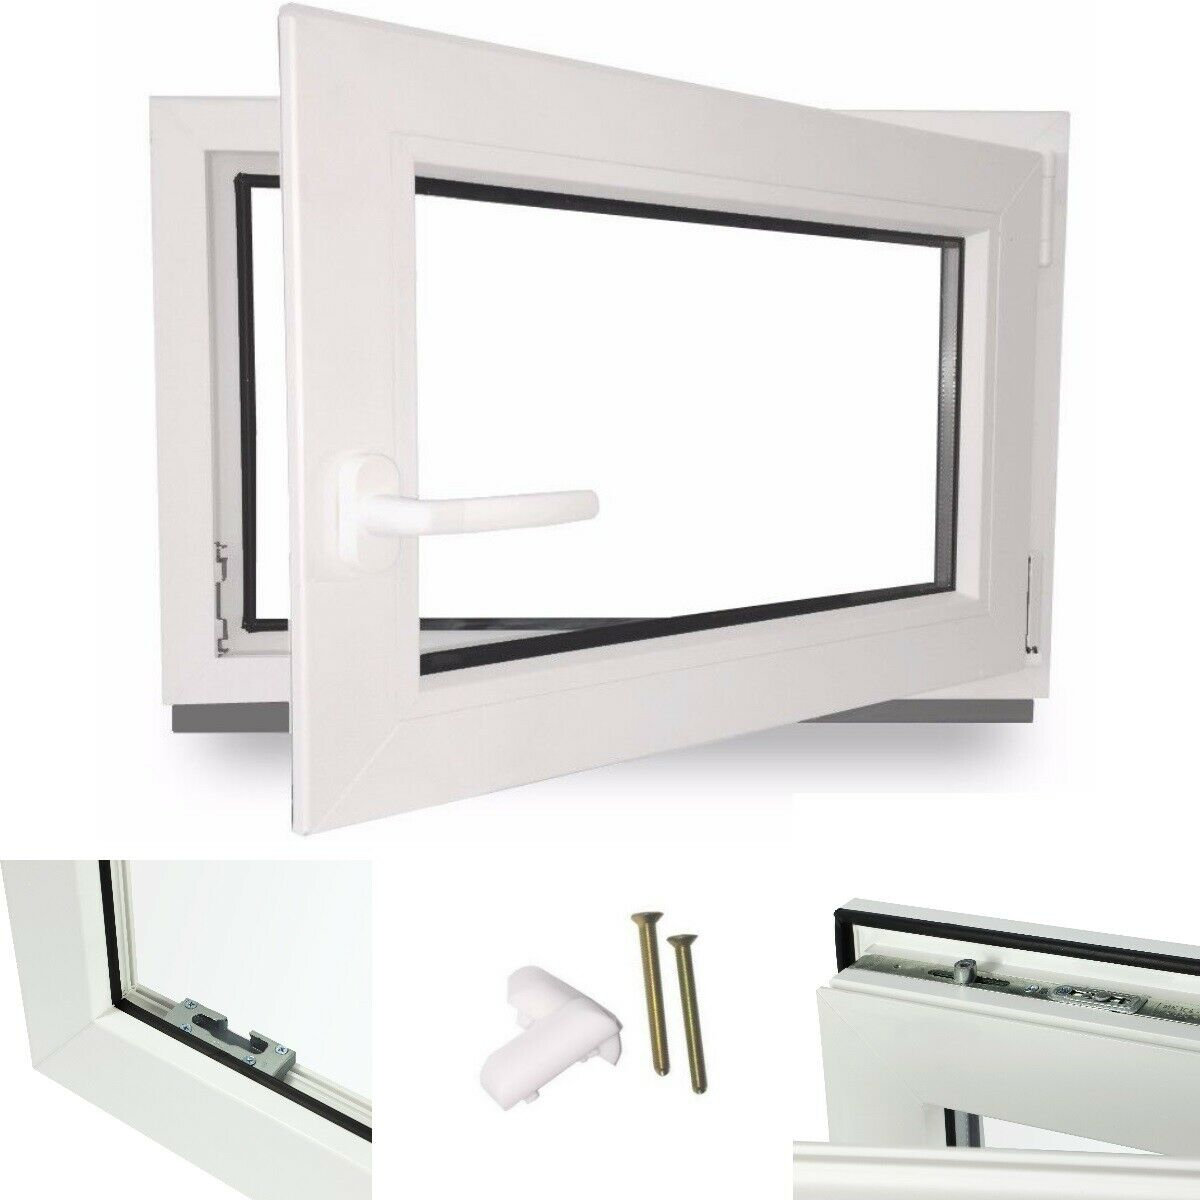 Fenster Kellerfenster Kunststofffenster Garagenfenster Dreh Kipp Lagerware